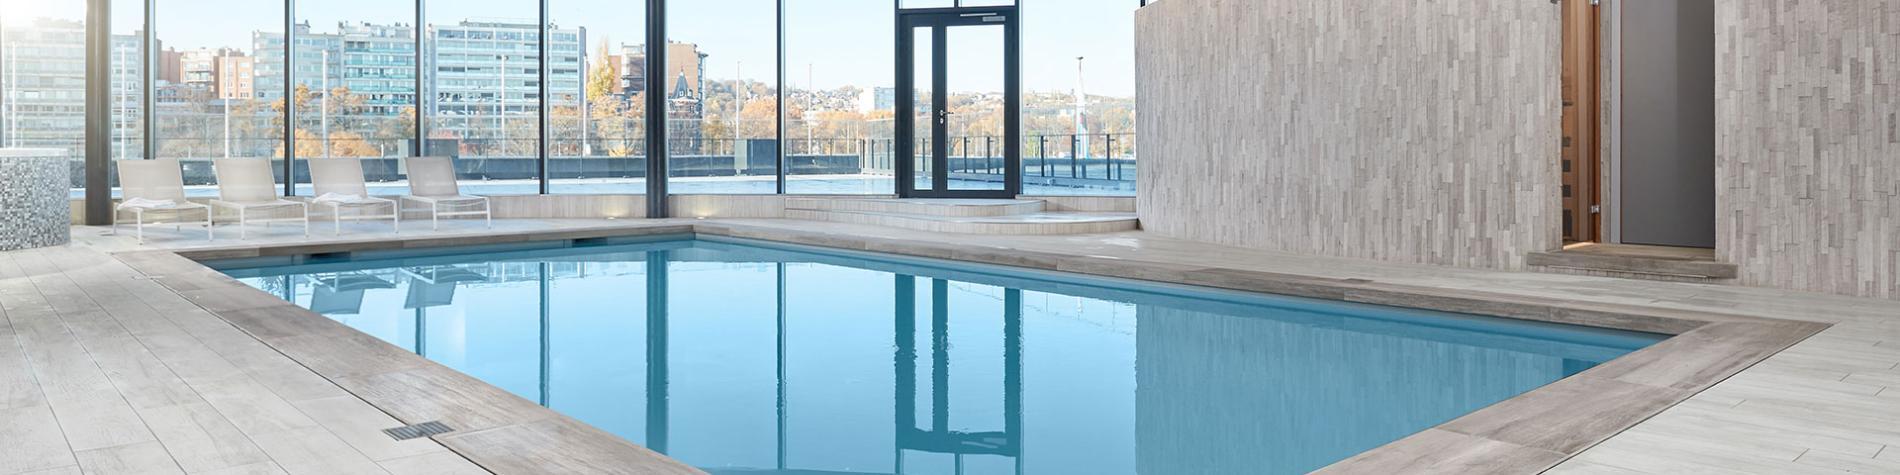 Hôtel - restaurant - Van der Valk - Liège Congrès - piscine